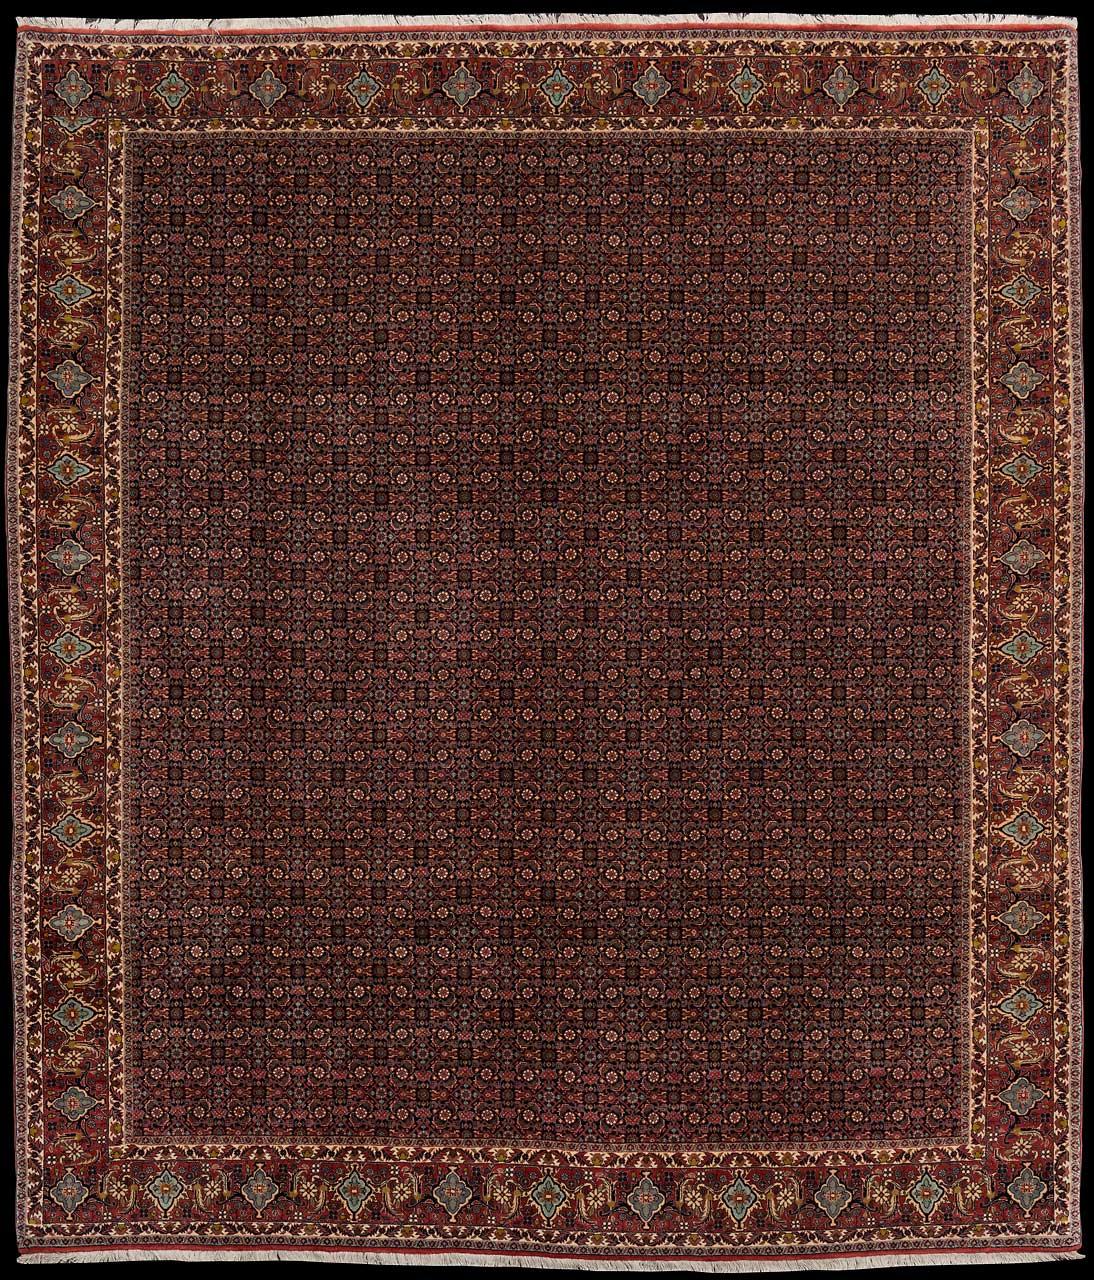 teppich nr 16487 bidjar persien gr sse 305 cm x 263 cm teppich mesgarzadeh www. Black Bedroom Furniture Sets. Home Design Ideas